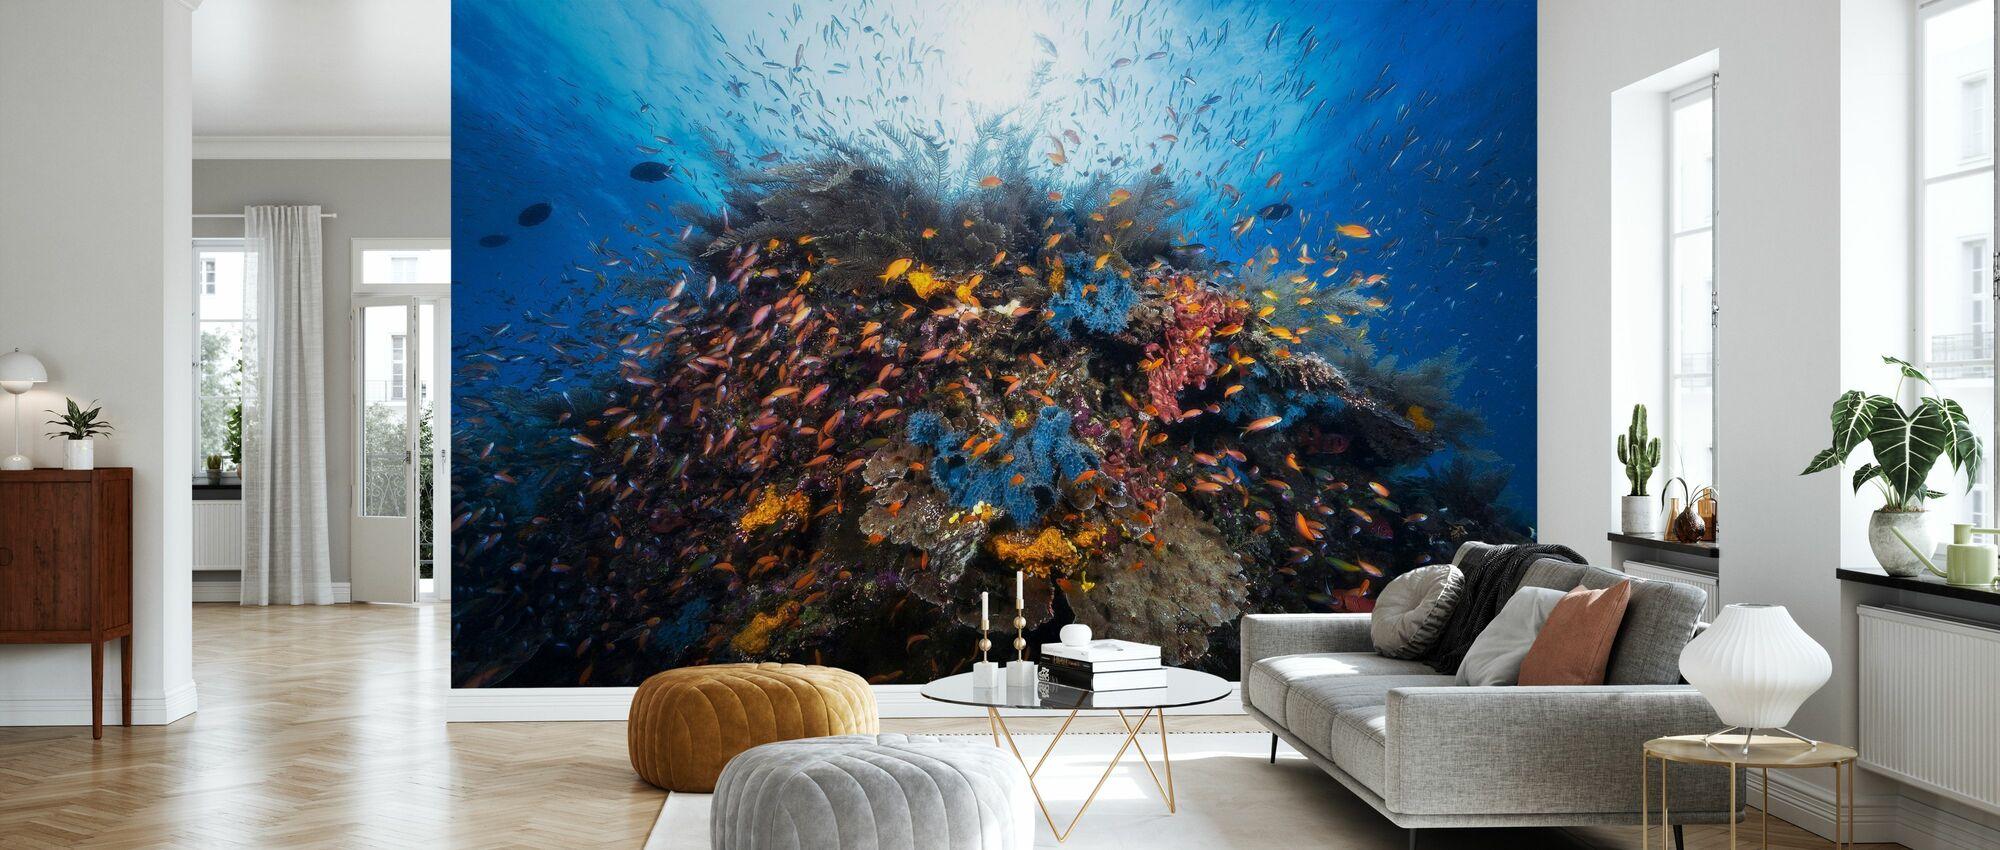 Life Explosion - Wallpaper - Living Room